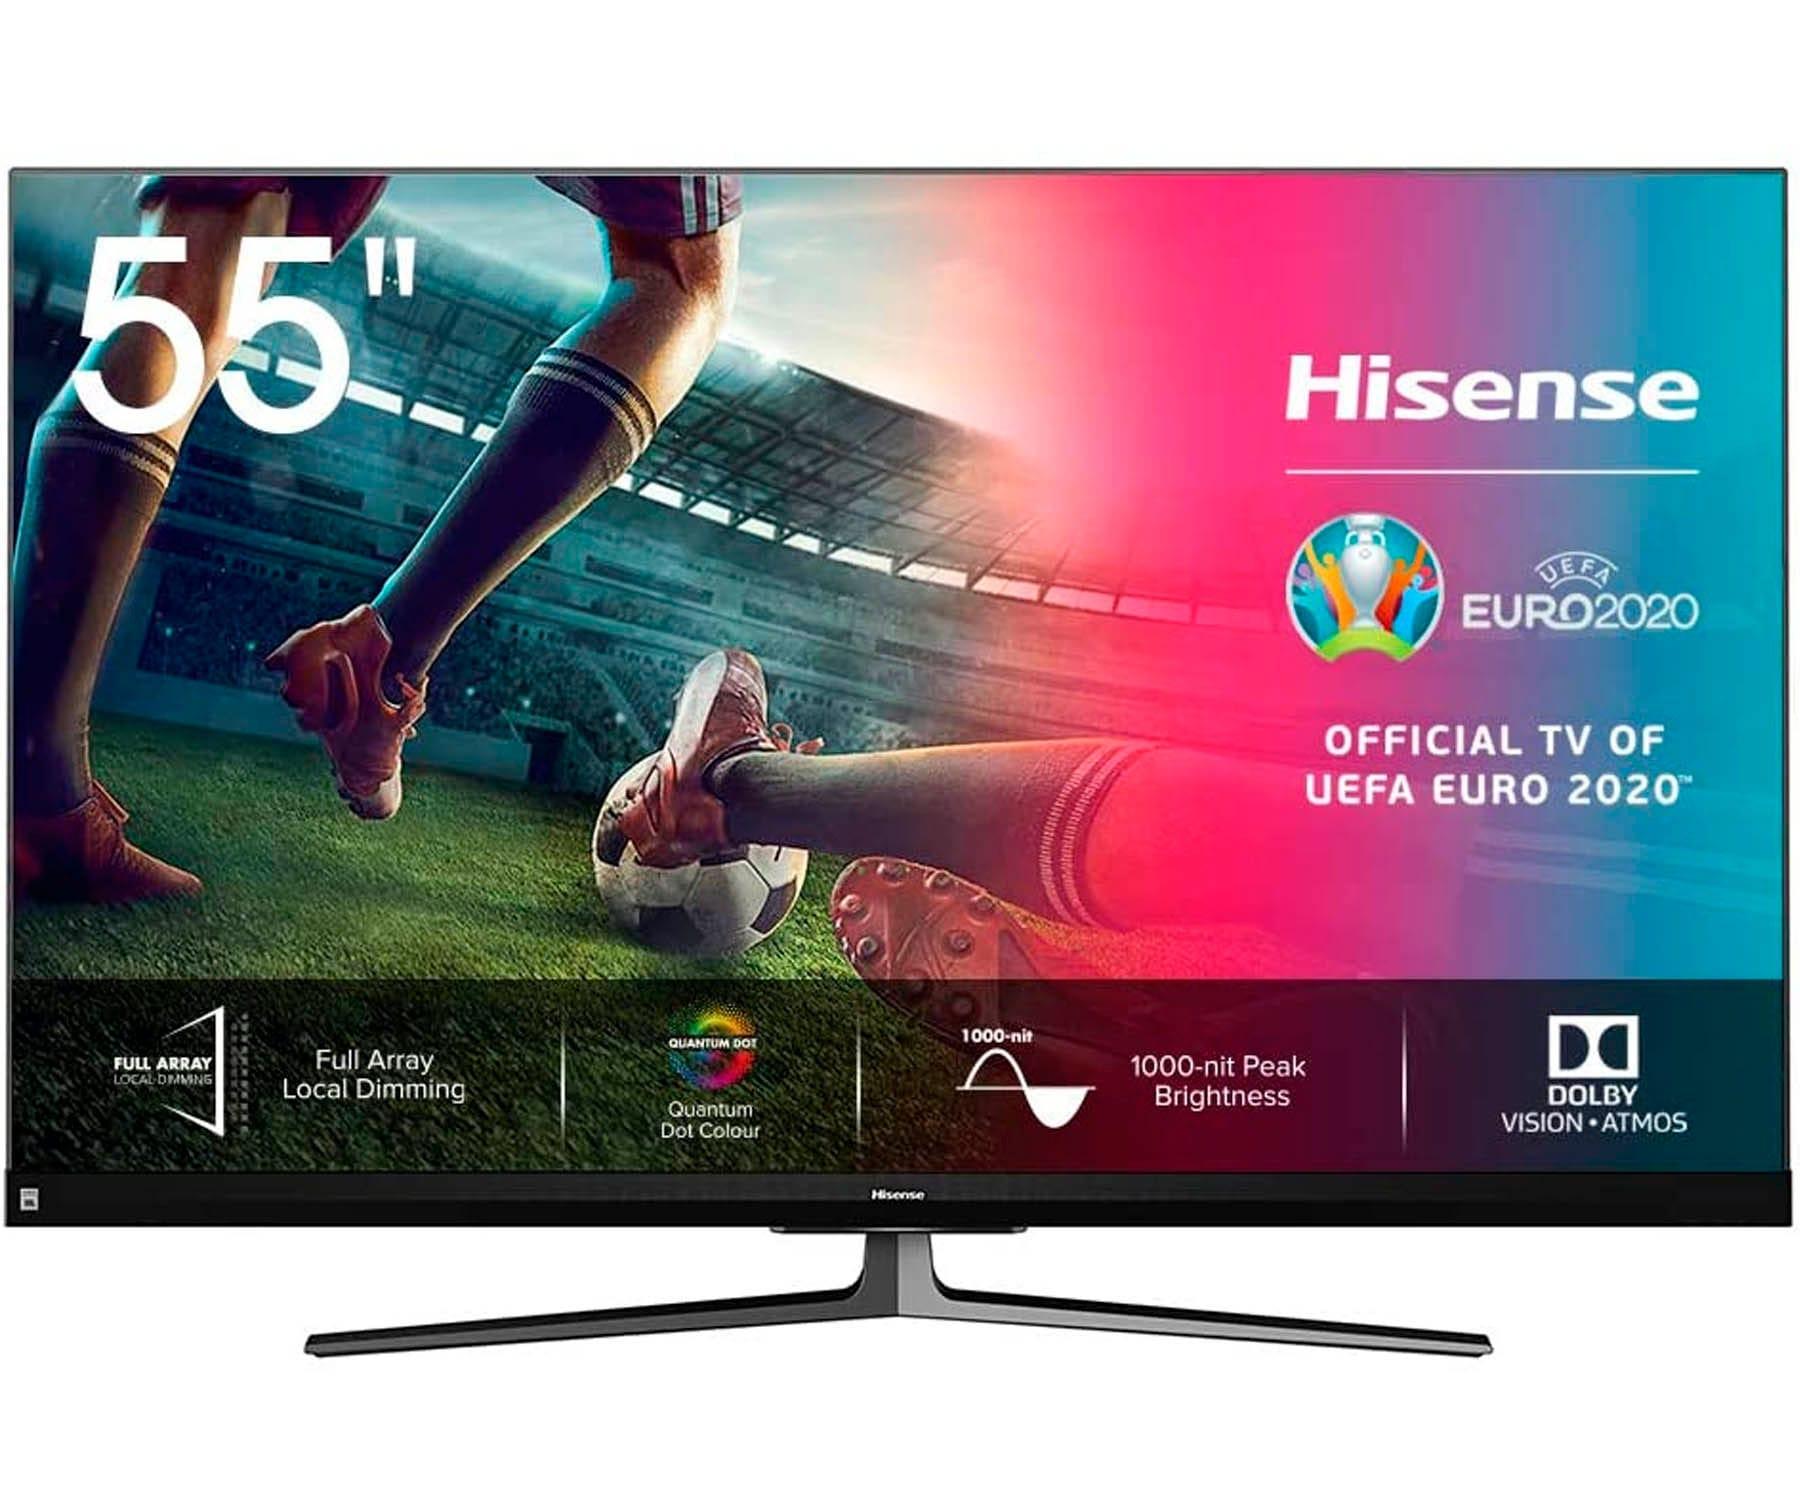 HISENSE H55U8QF TELEVISOR 55'' SMART TV ULED 4K UHD HDR 120Hz CI+ HDMI USB BLUETOOTH